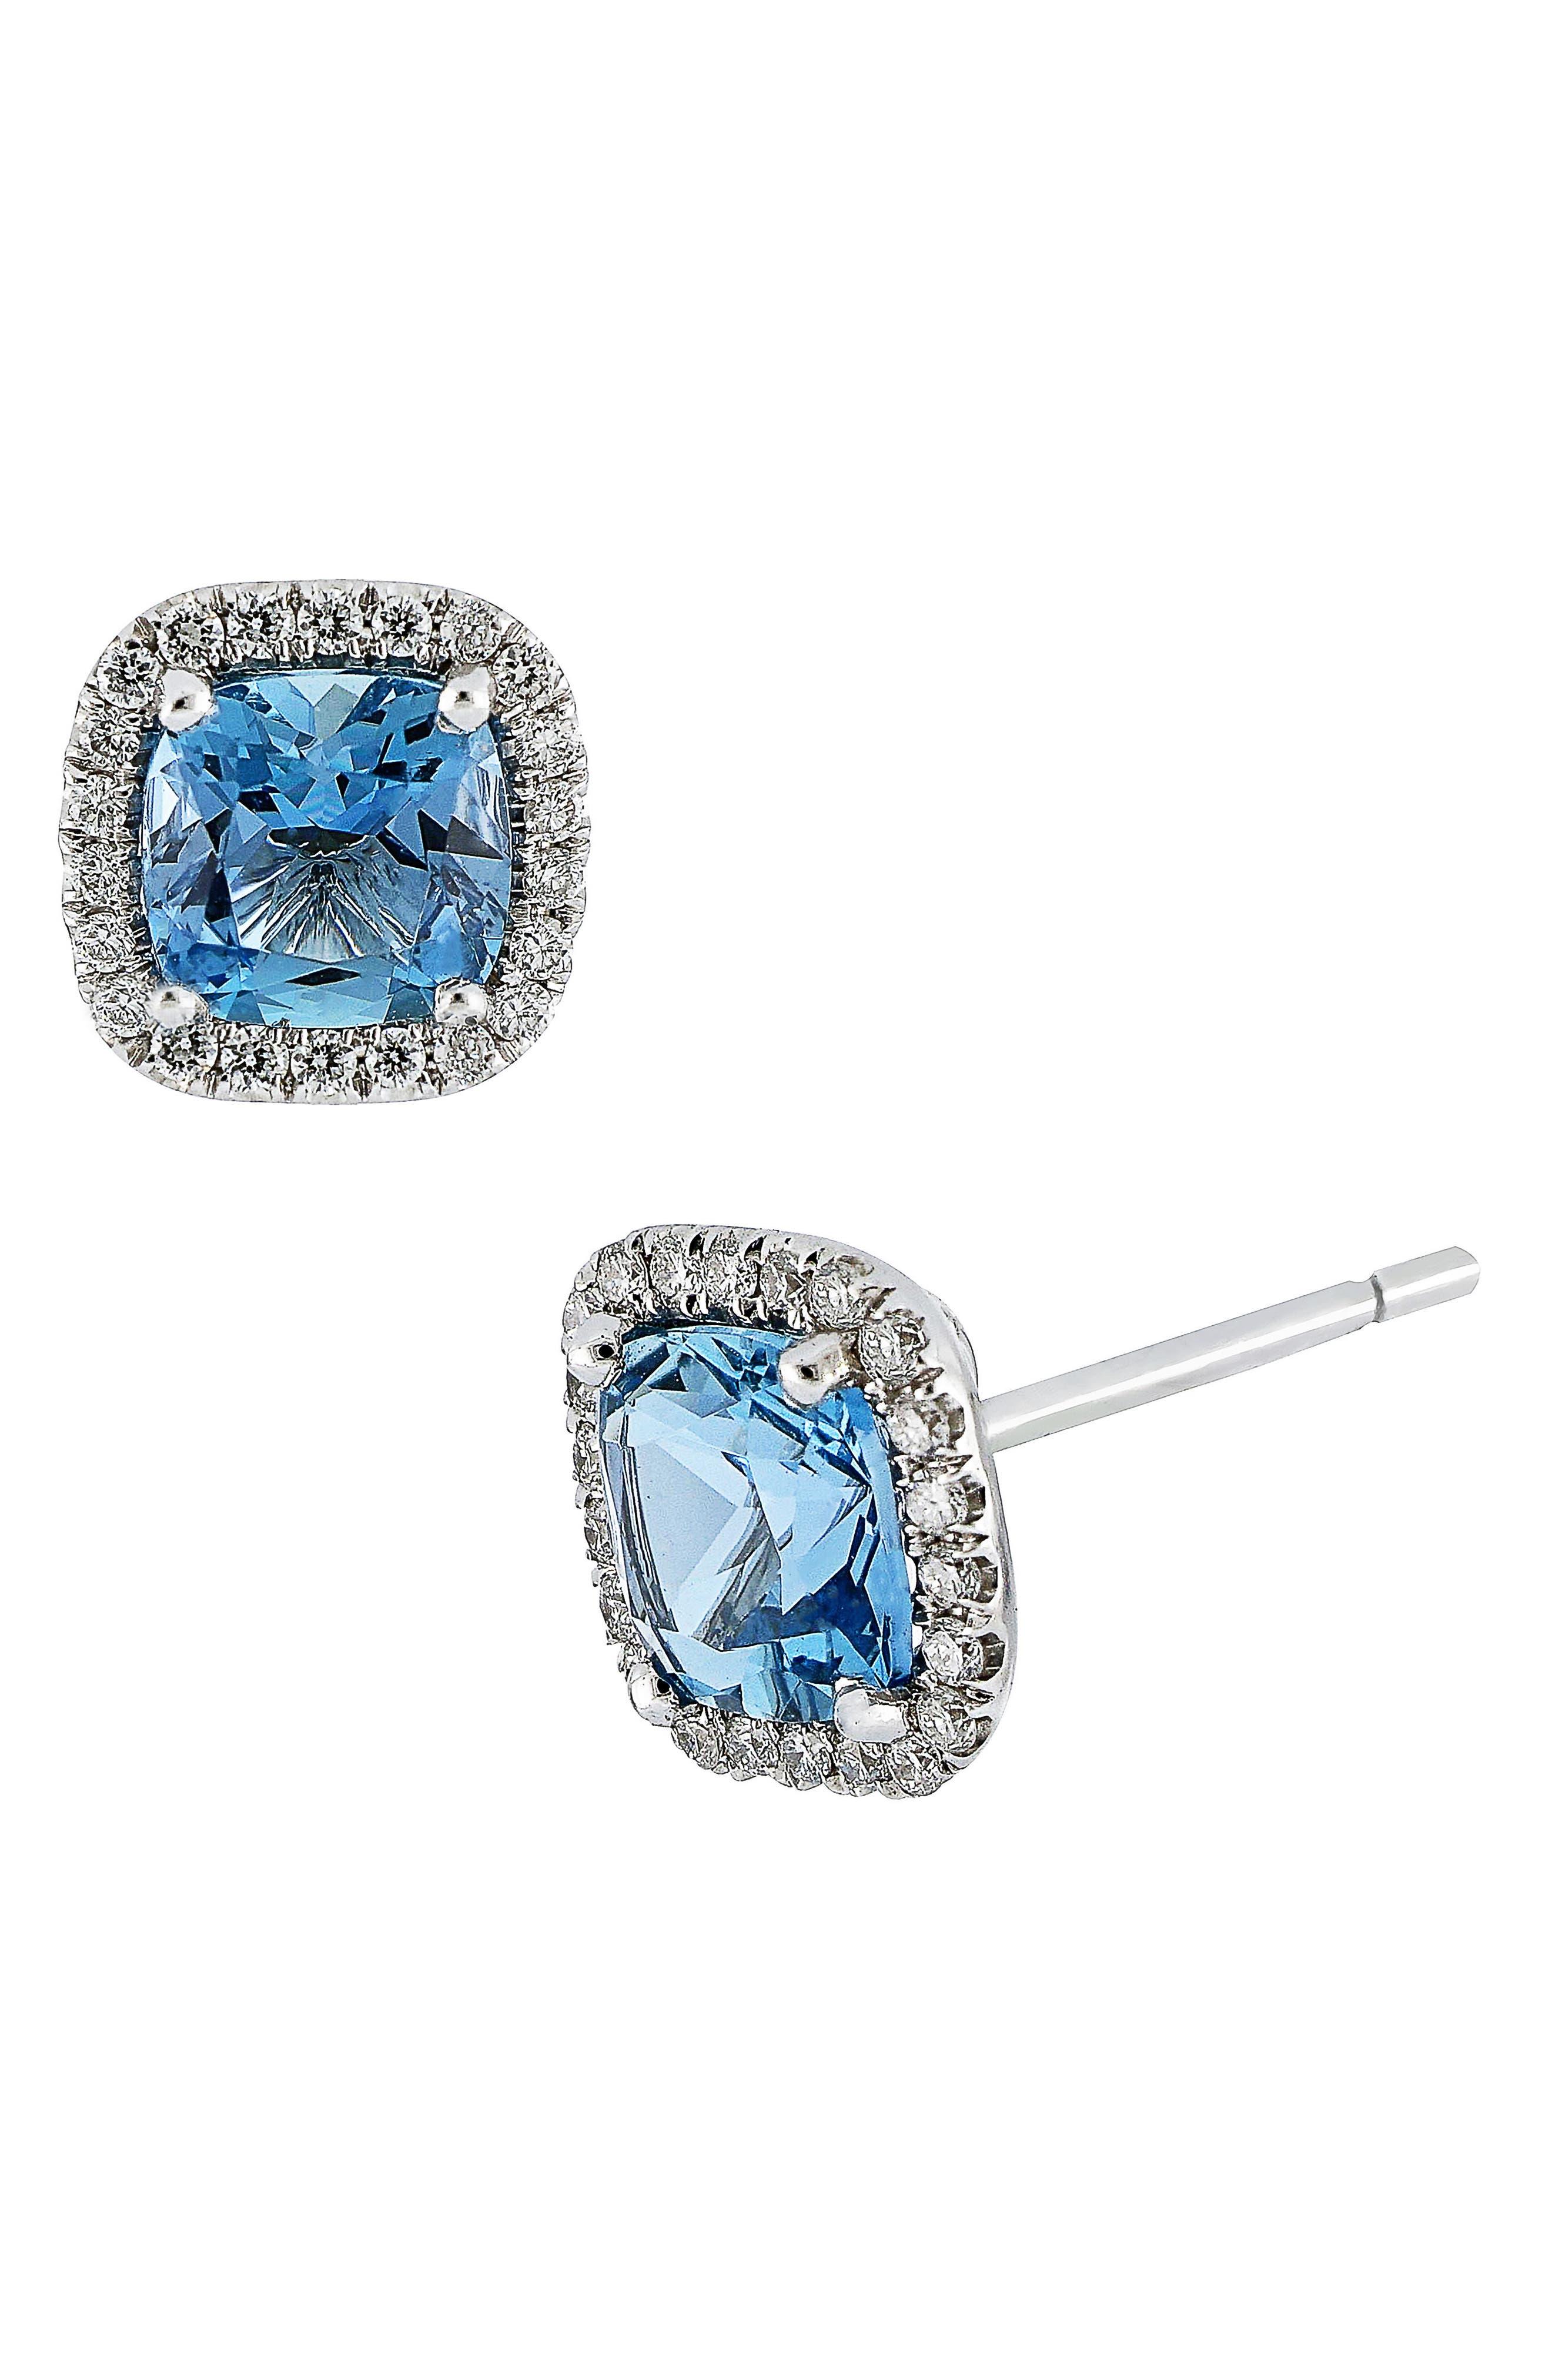 Alternate Image 1 Selected - Bony Levy Aquamarine & Diamond Earrings (Nordstrom Exclusive)